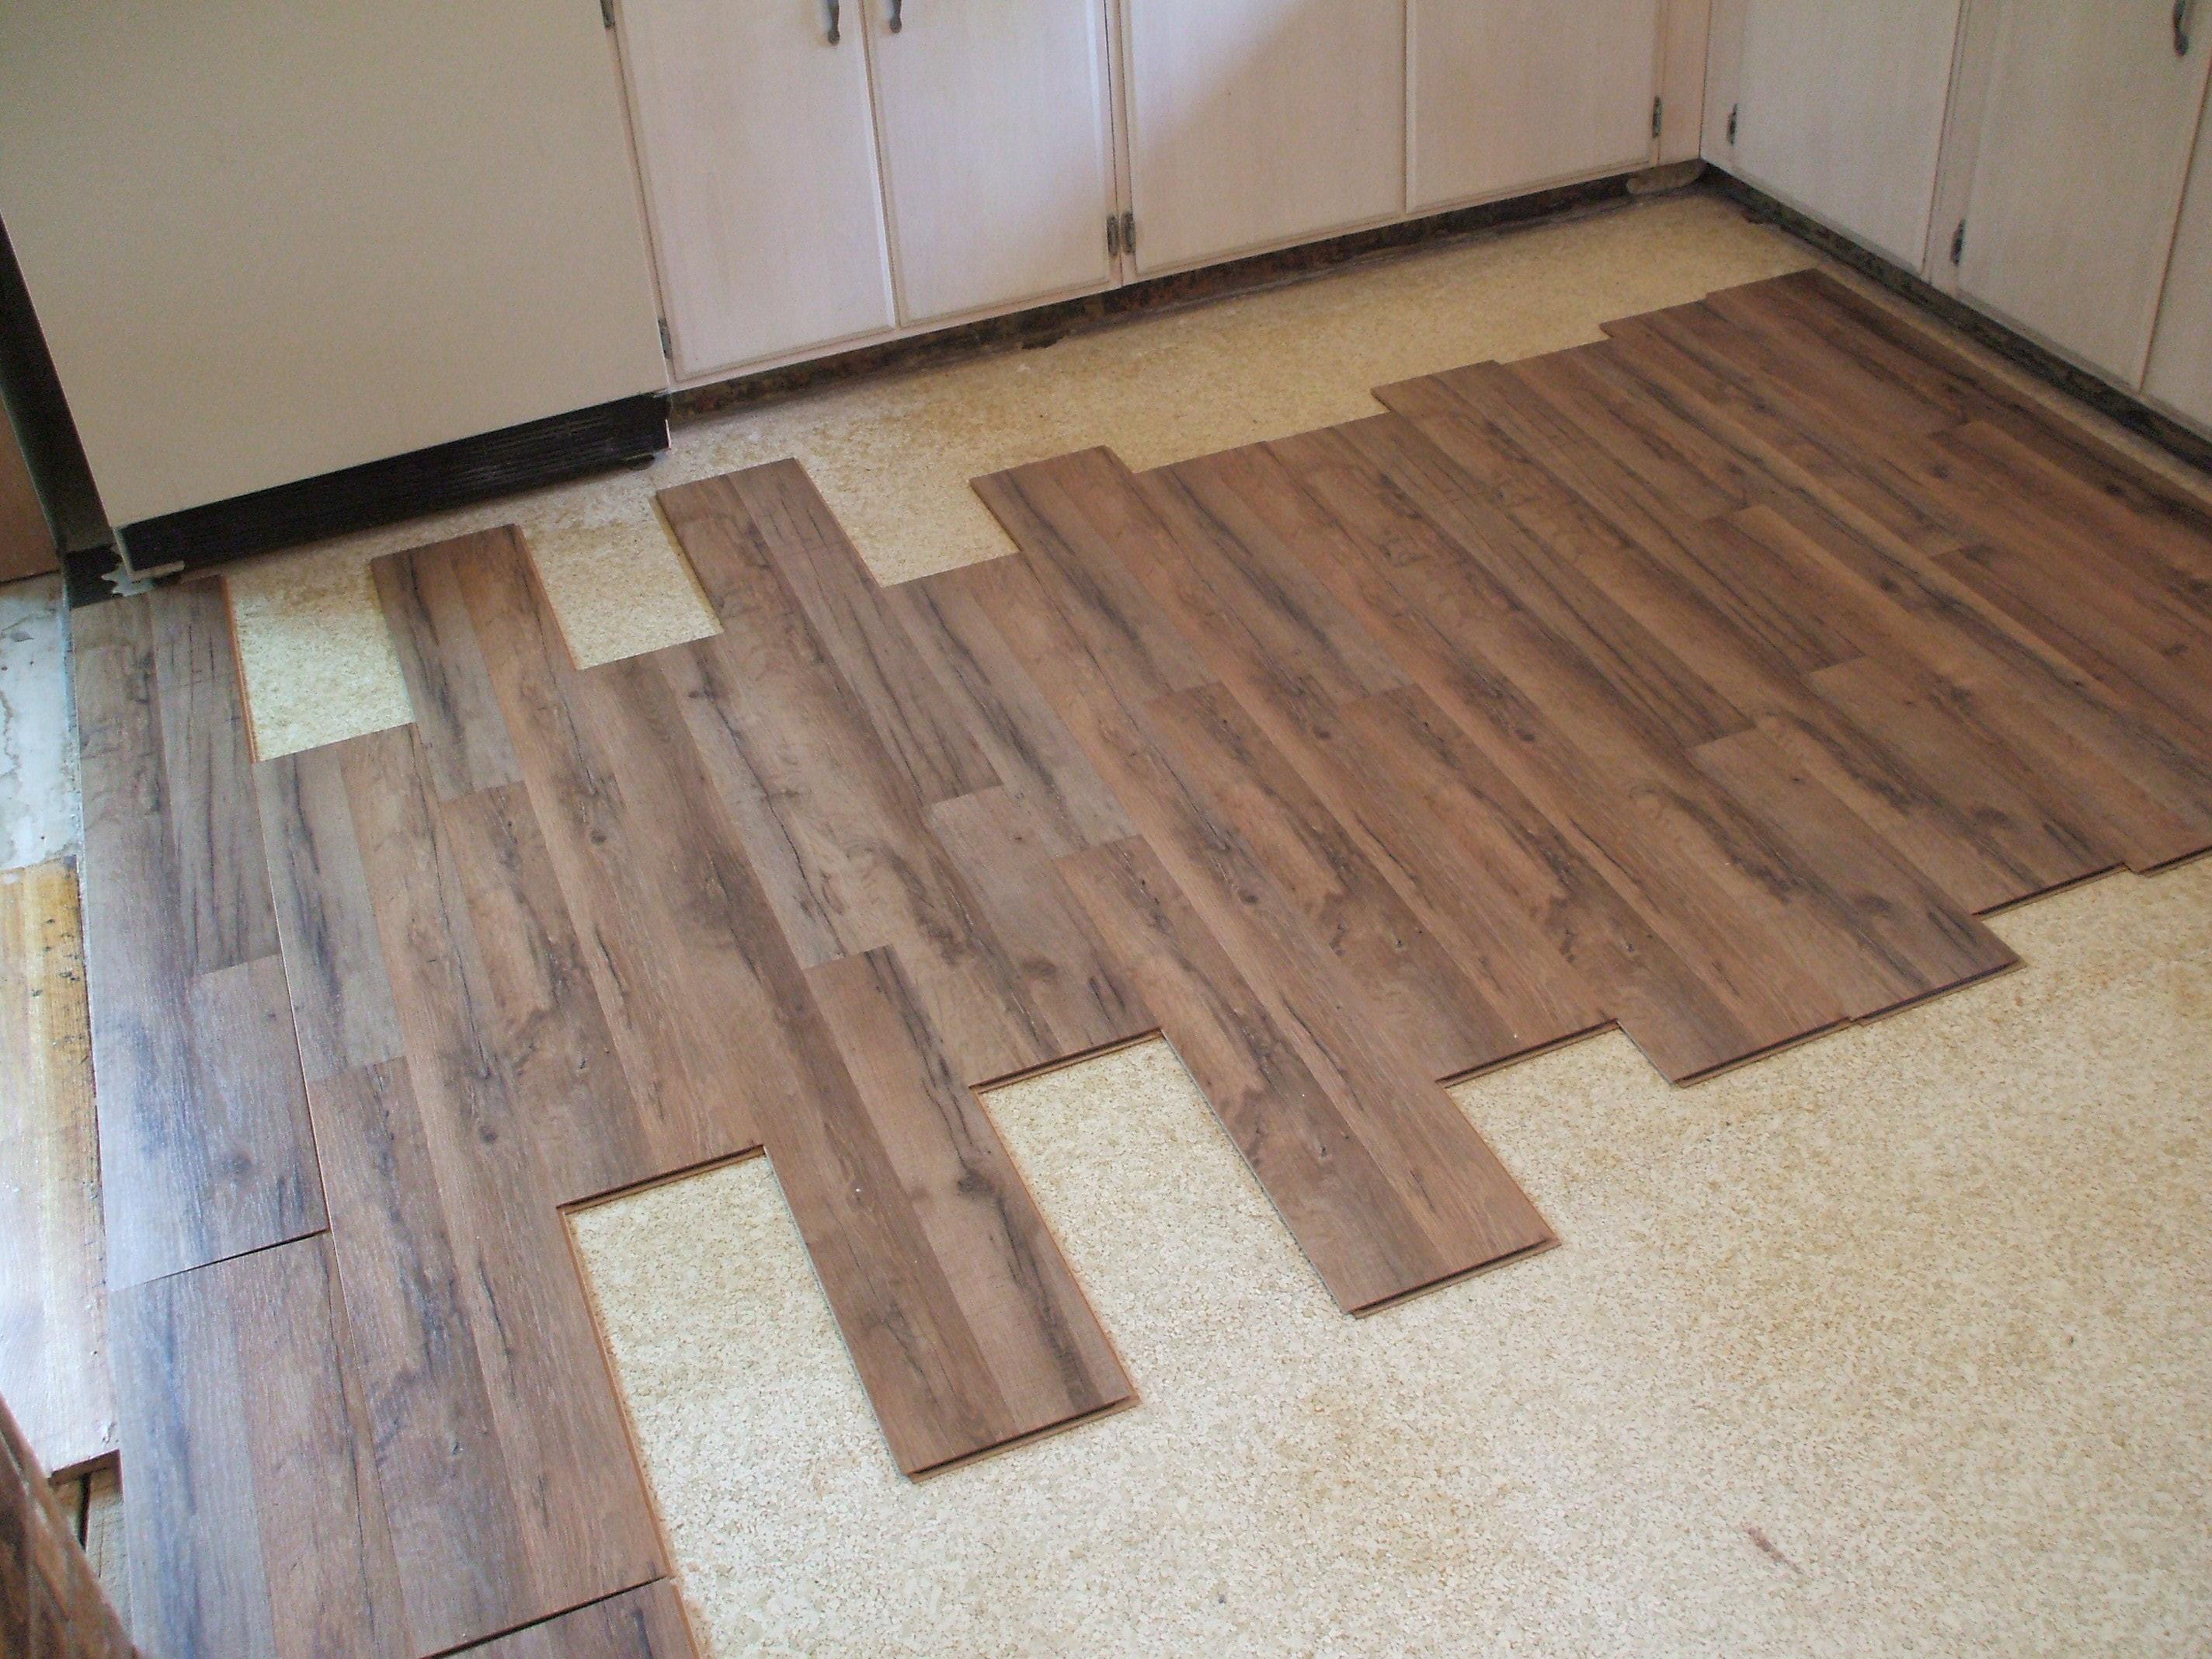 bruce oak marsh hardwood flooring of 14 new home depot bruce hardwood photograph dizpos com for 29 inspirational s bruce hardwood and laminate floor cleaner